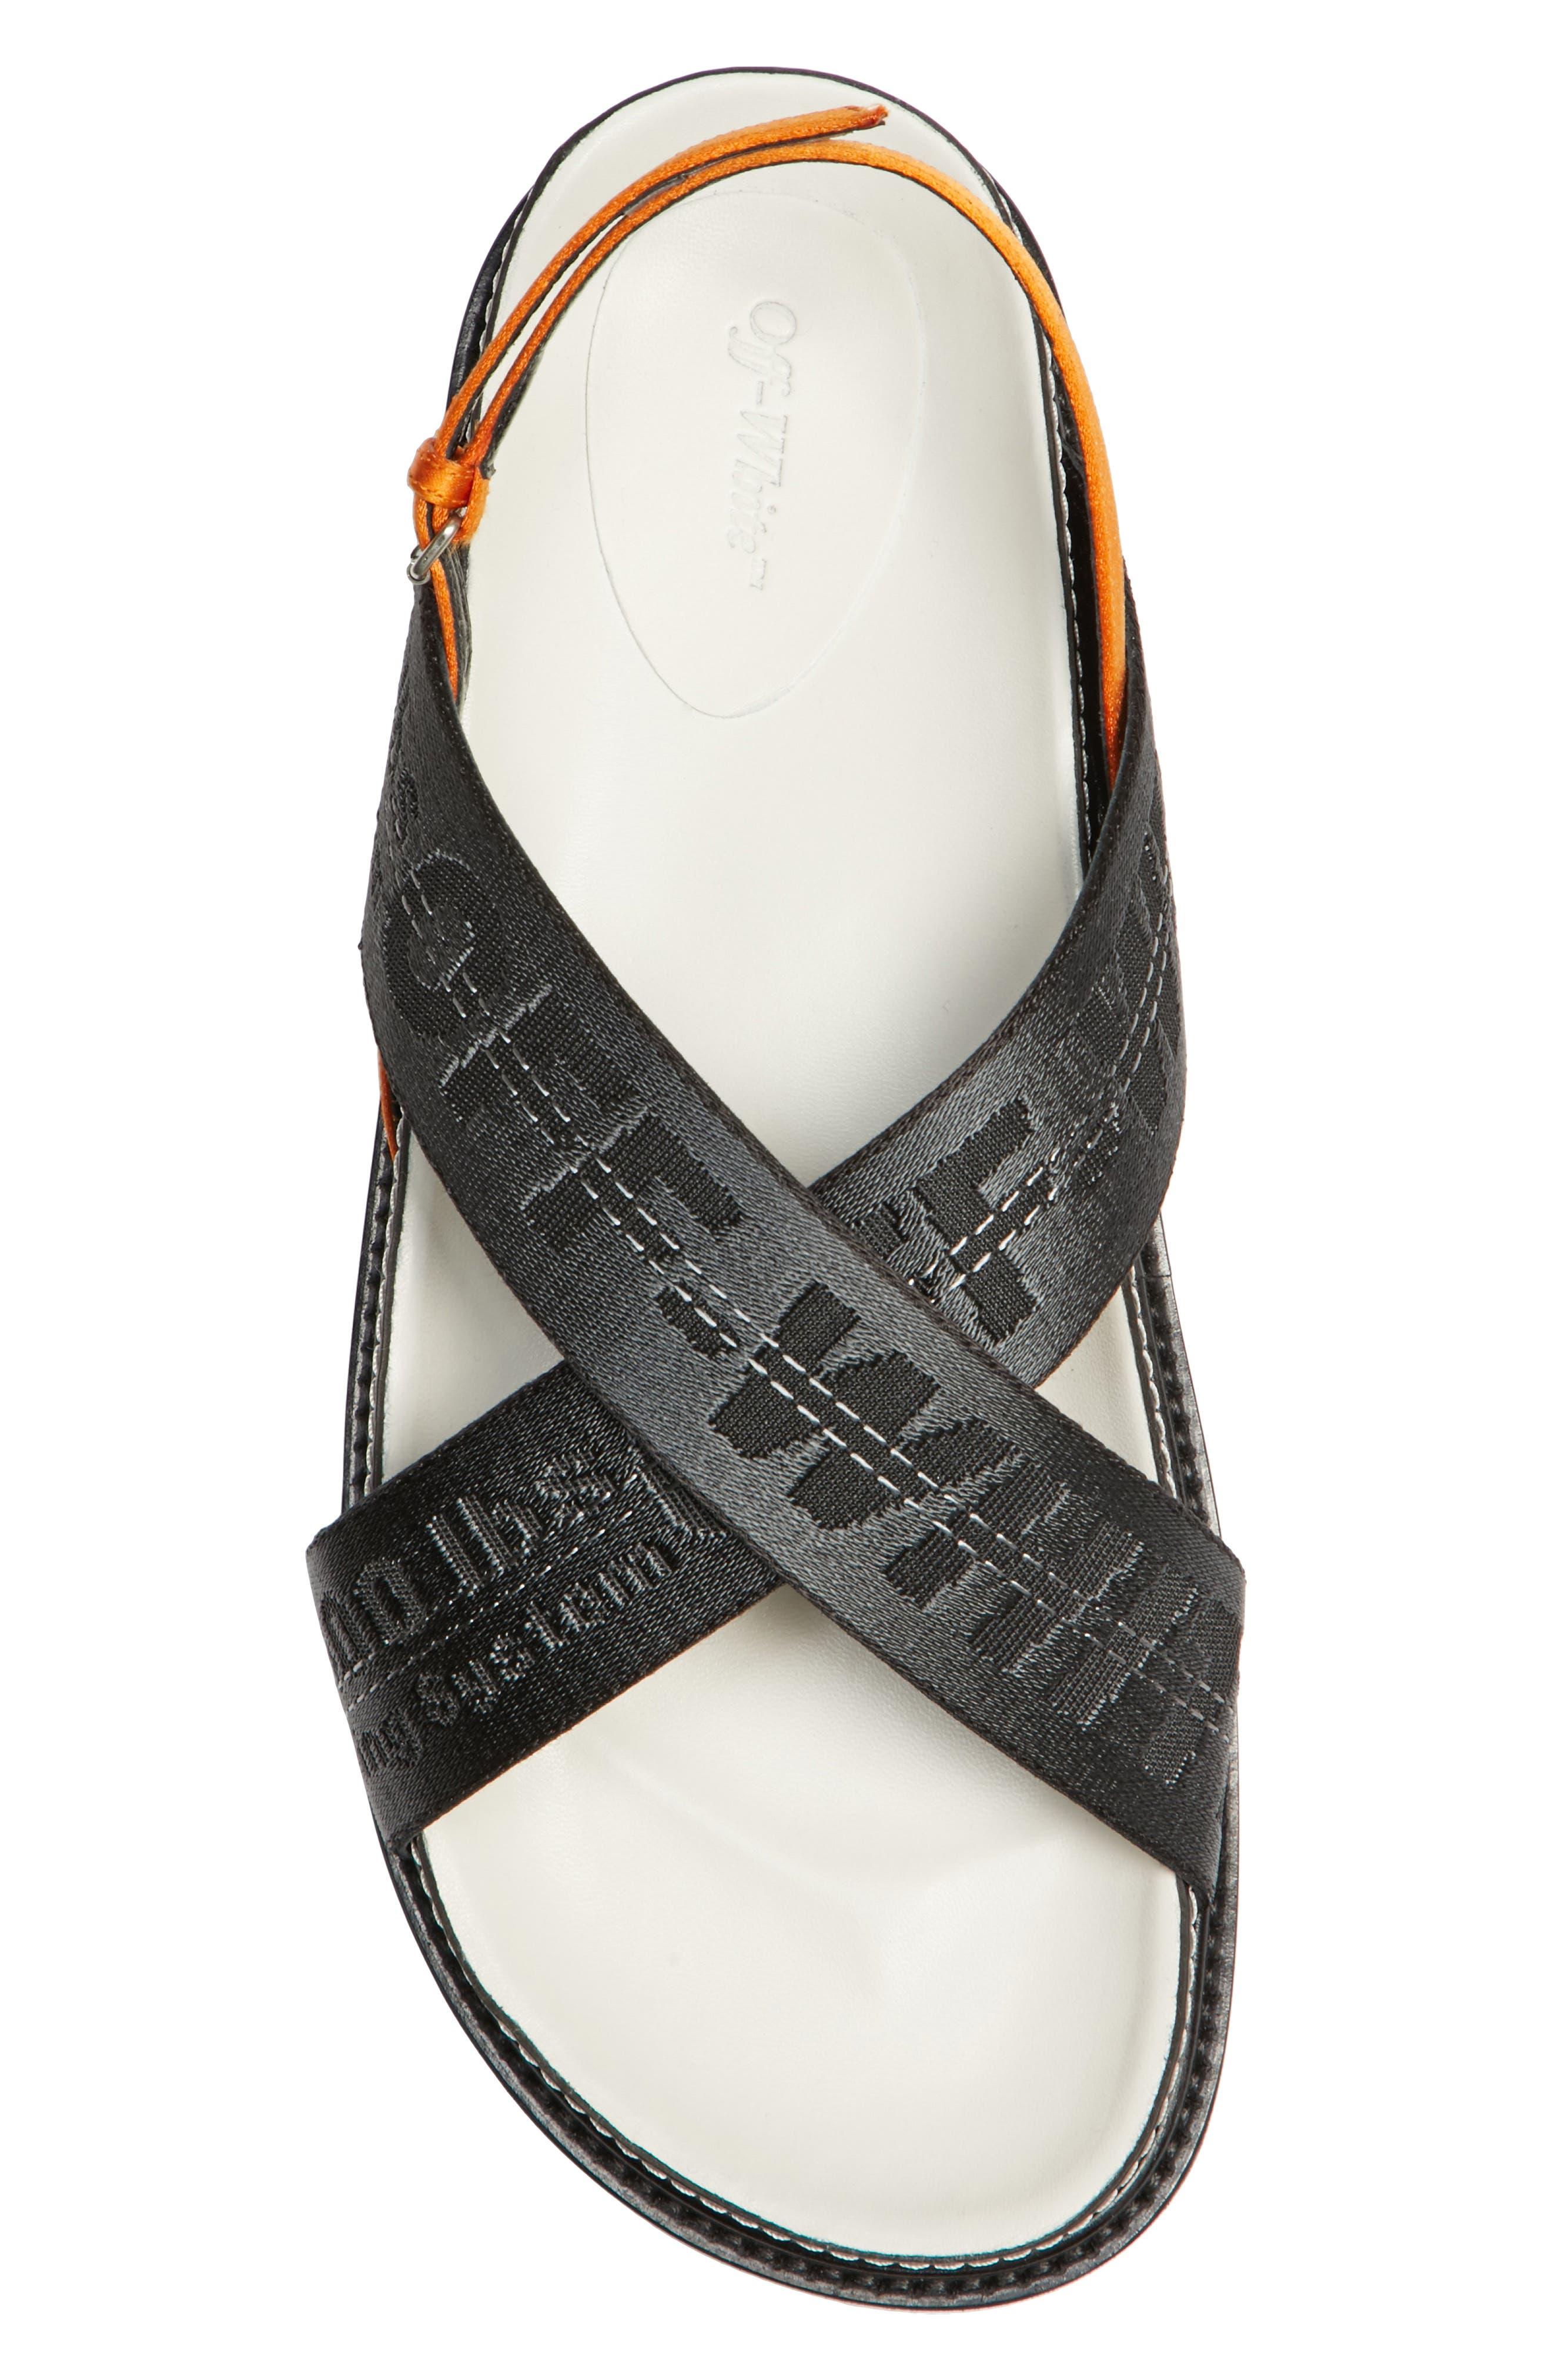 Industrial Belt Sandal,                             Alternate thumbnail 5, color,                             Black Black